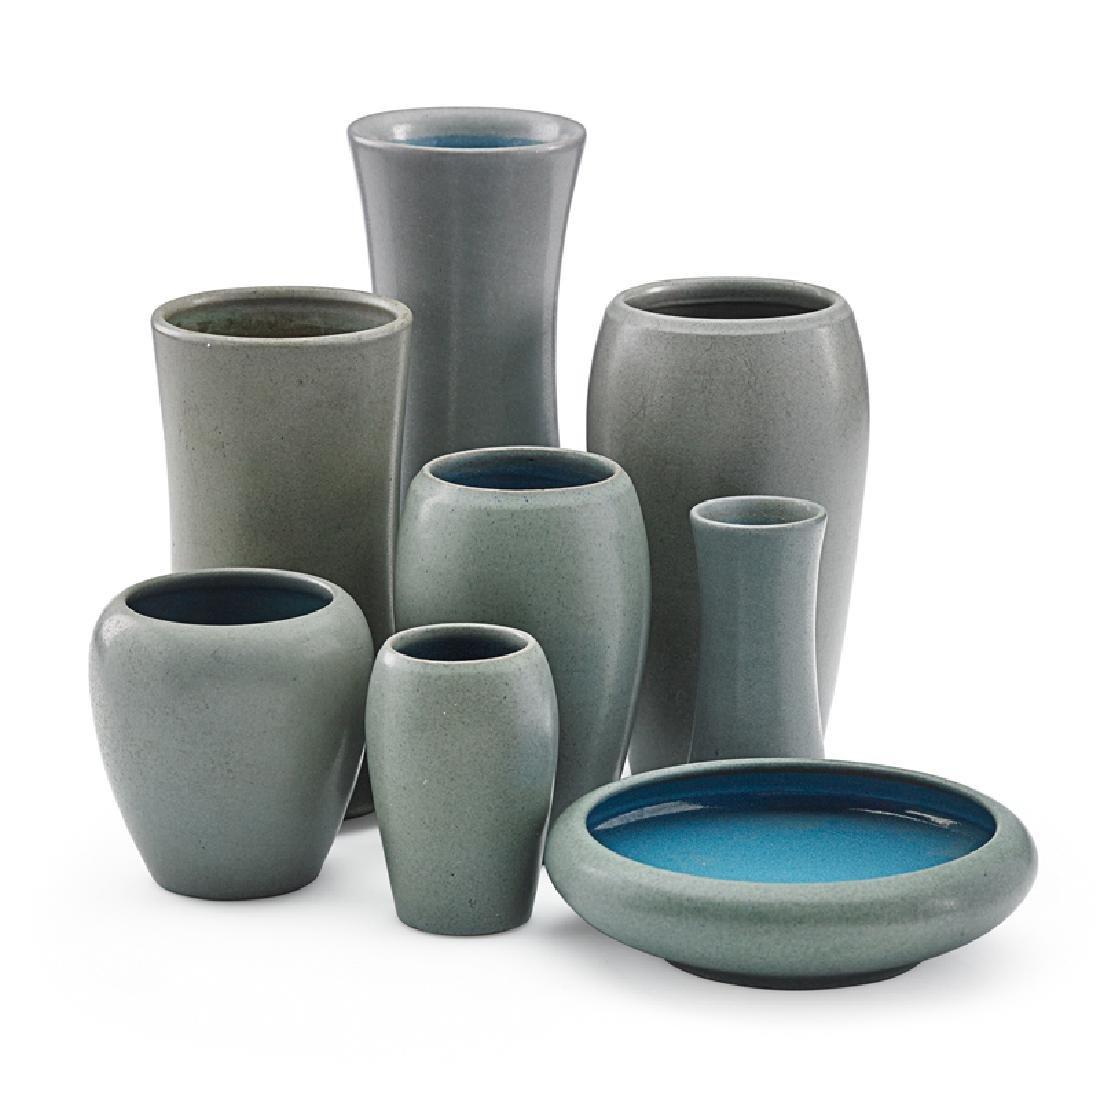 MARBLEHEAD Eight gray vases